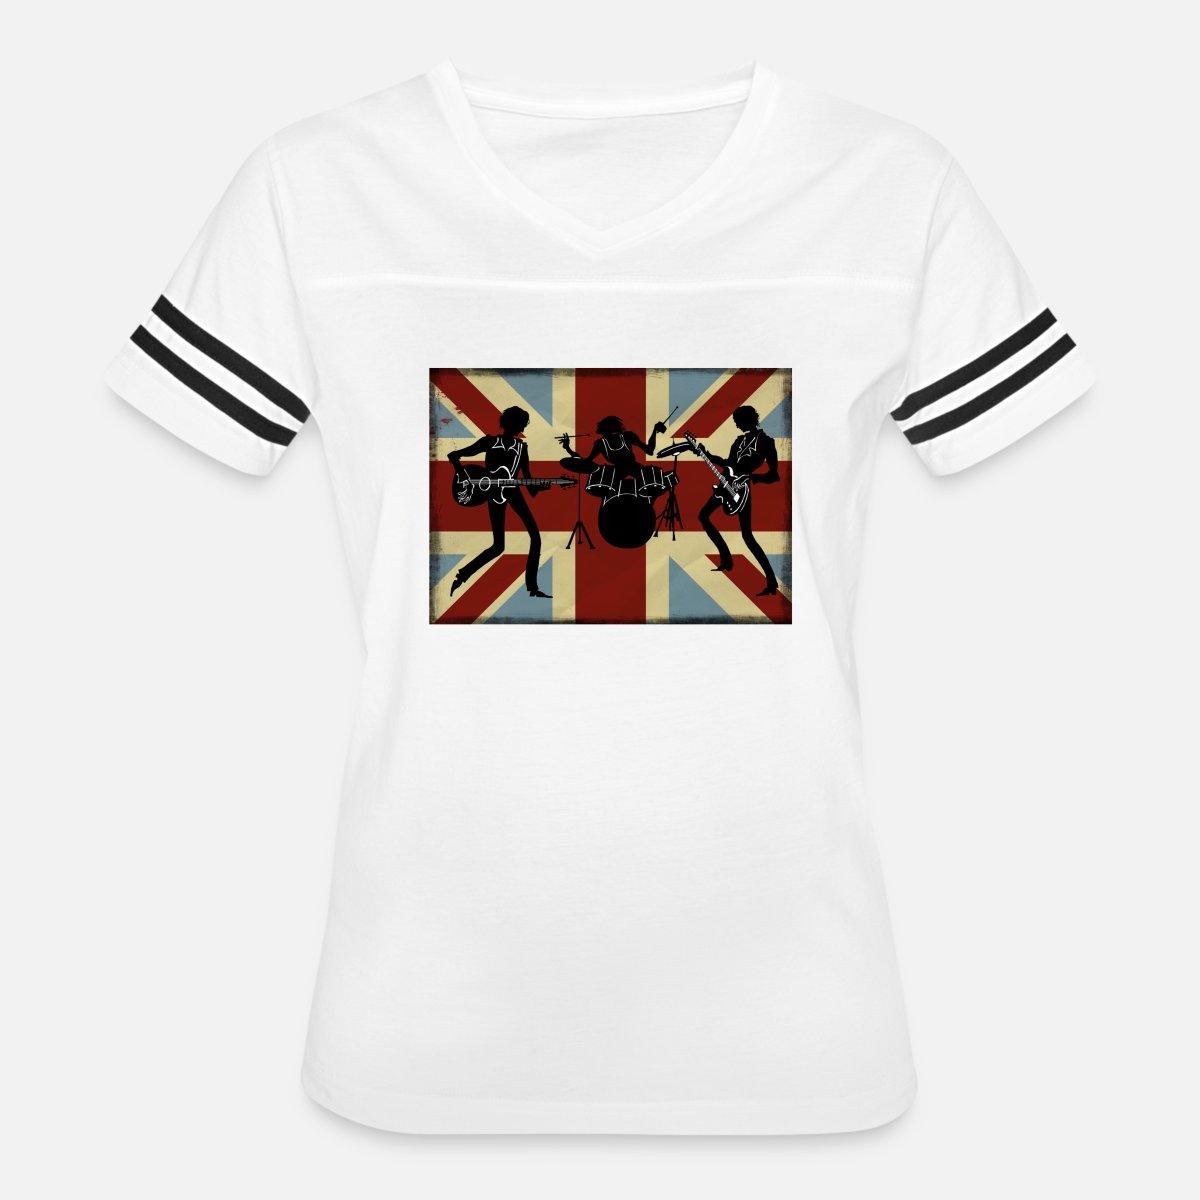 81789b445006 Womens Vintage T Shirts Uk - DREAMWORKS